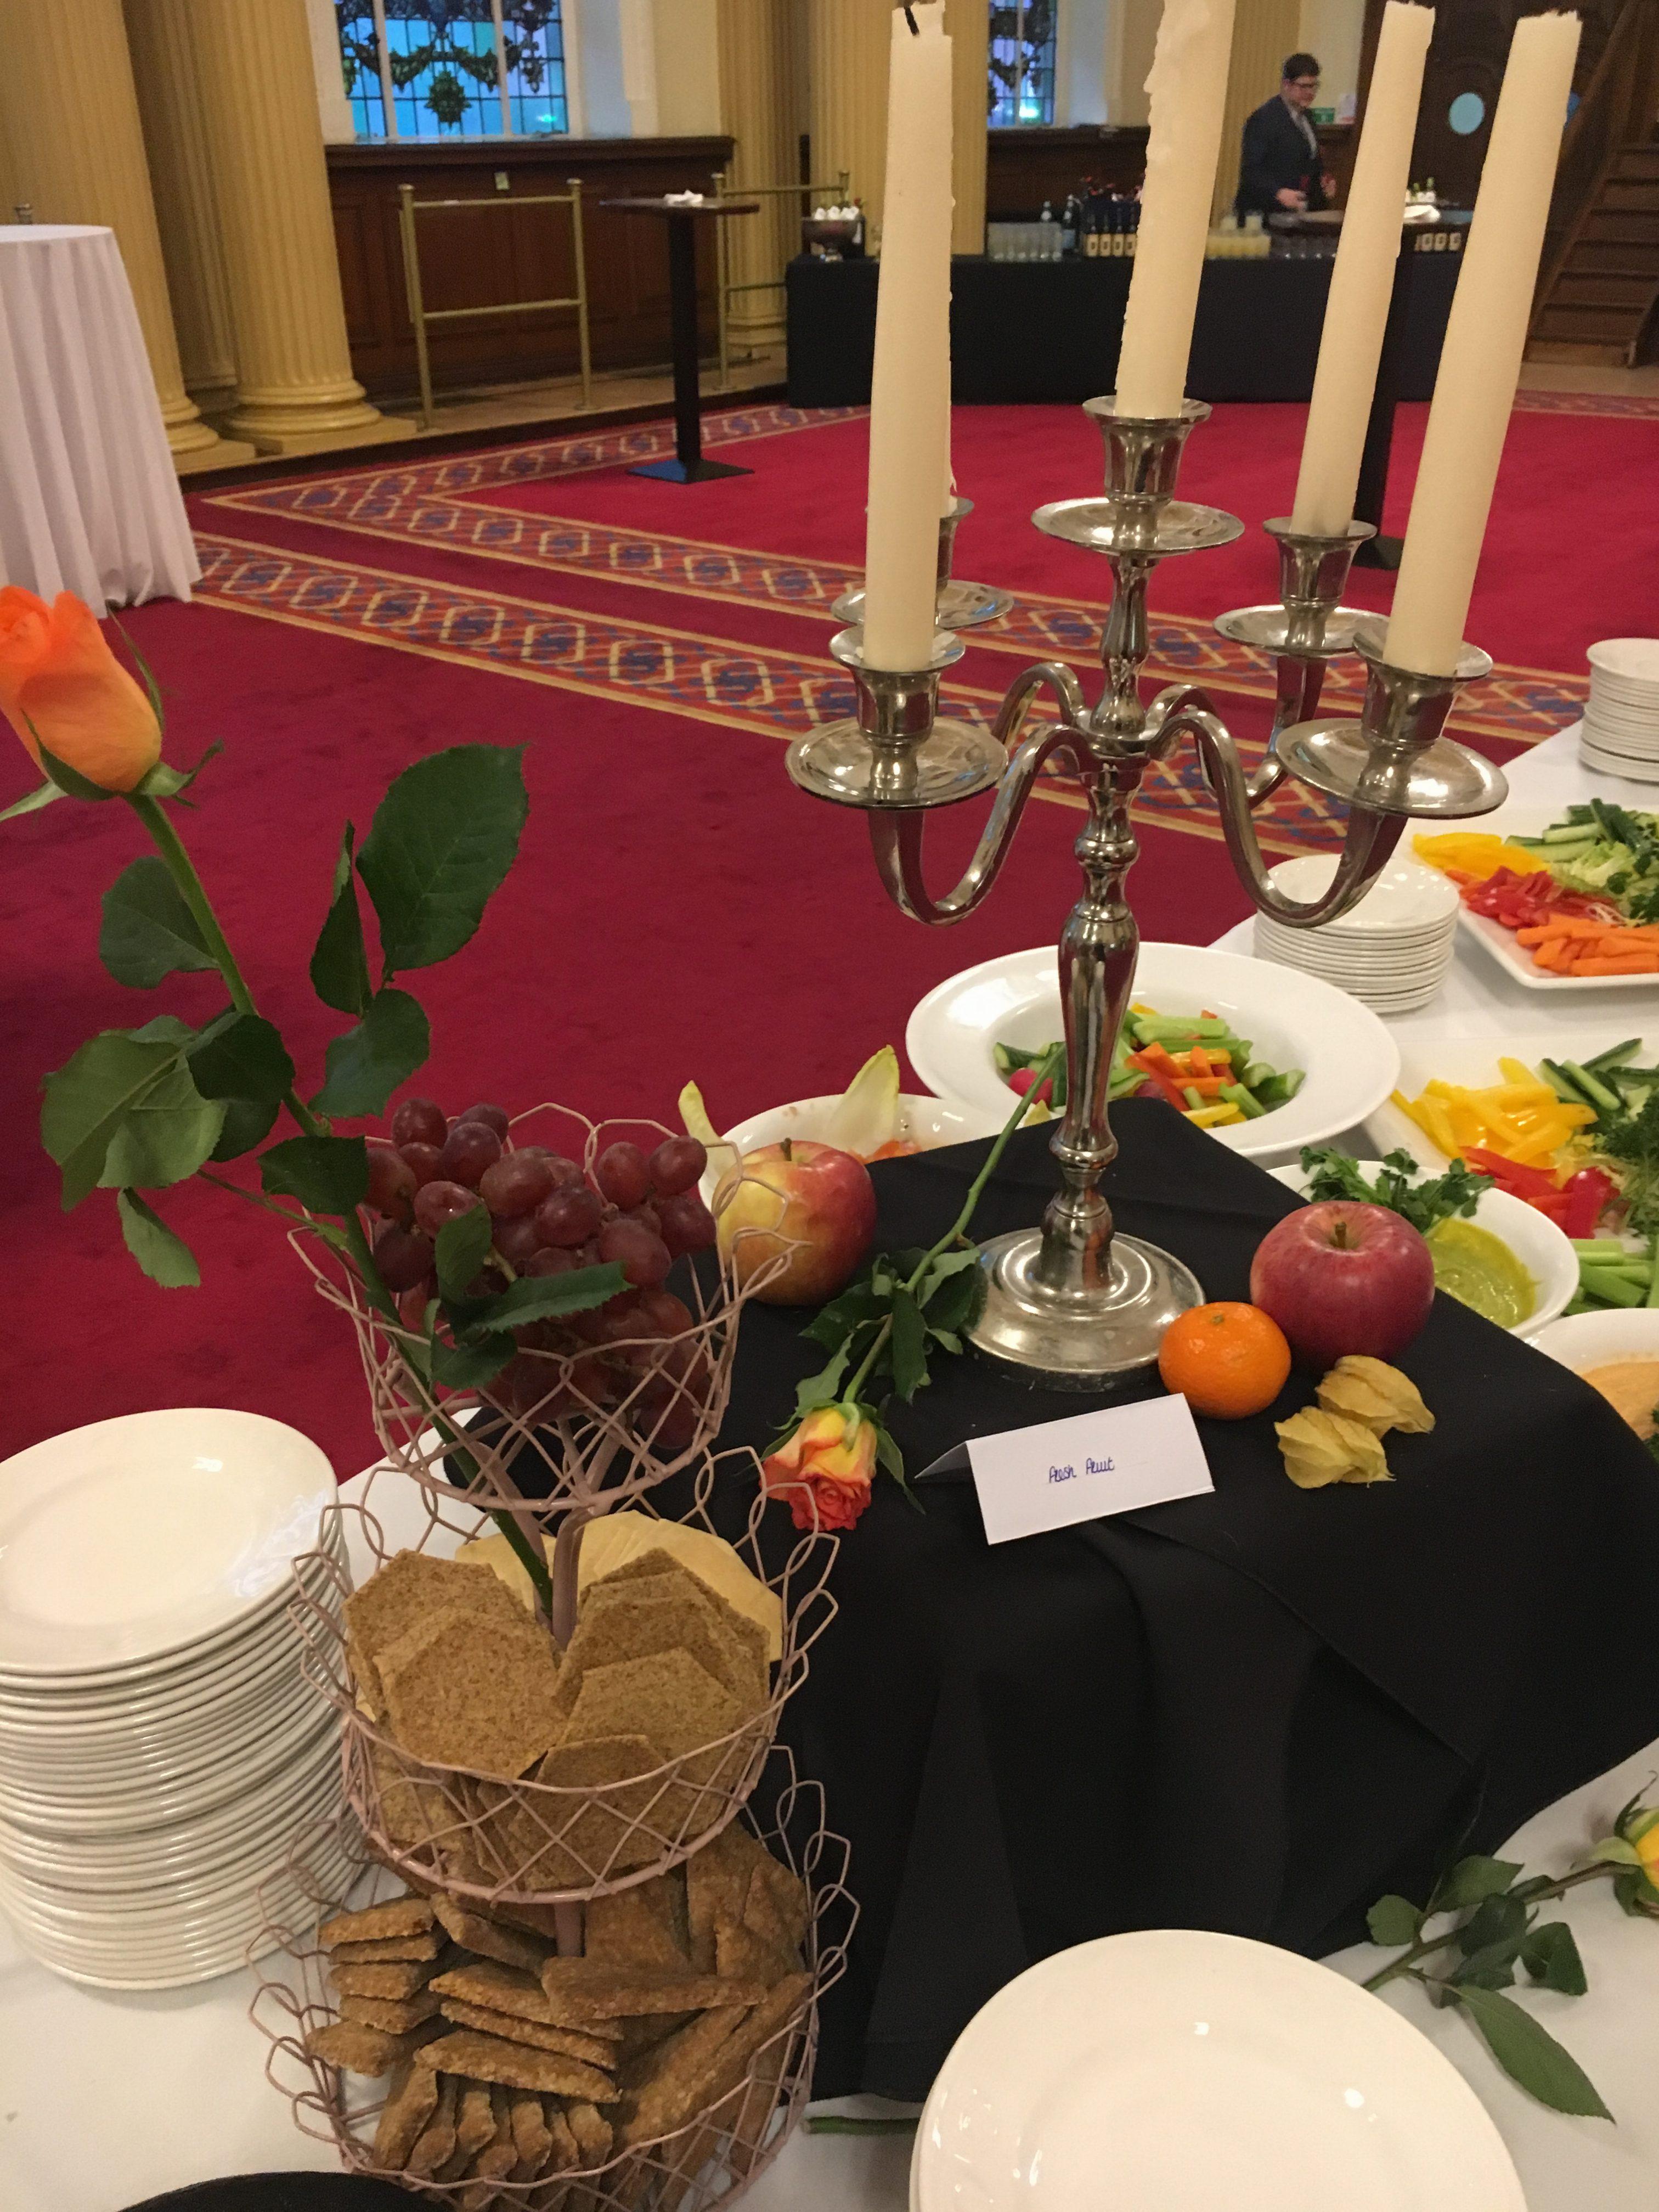 wedding caterers ireland | Posh Nosh Ireland